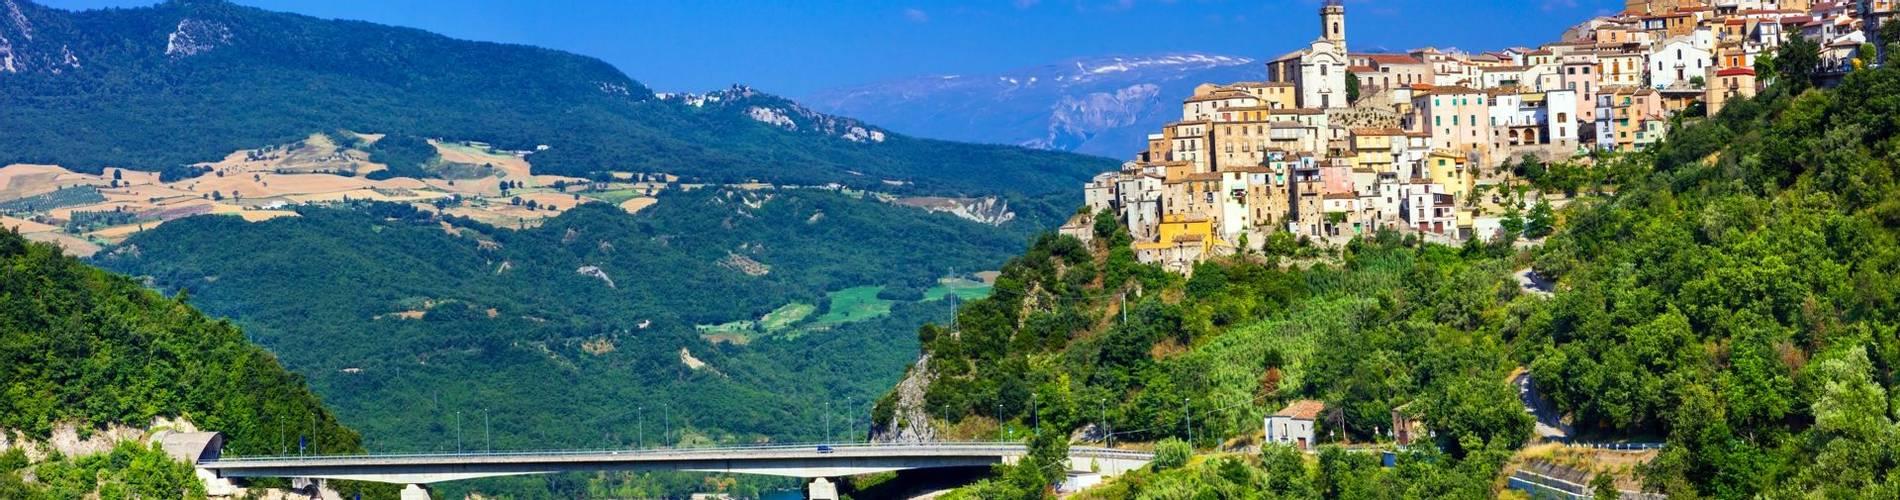 Abruzzo Transport.jpg